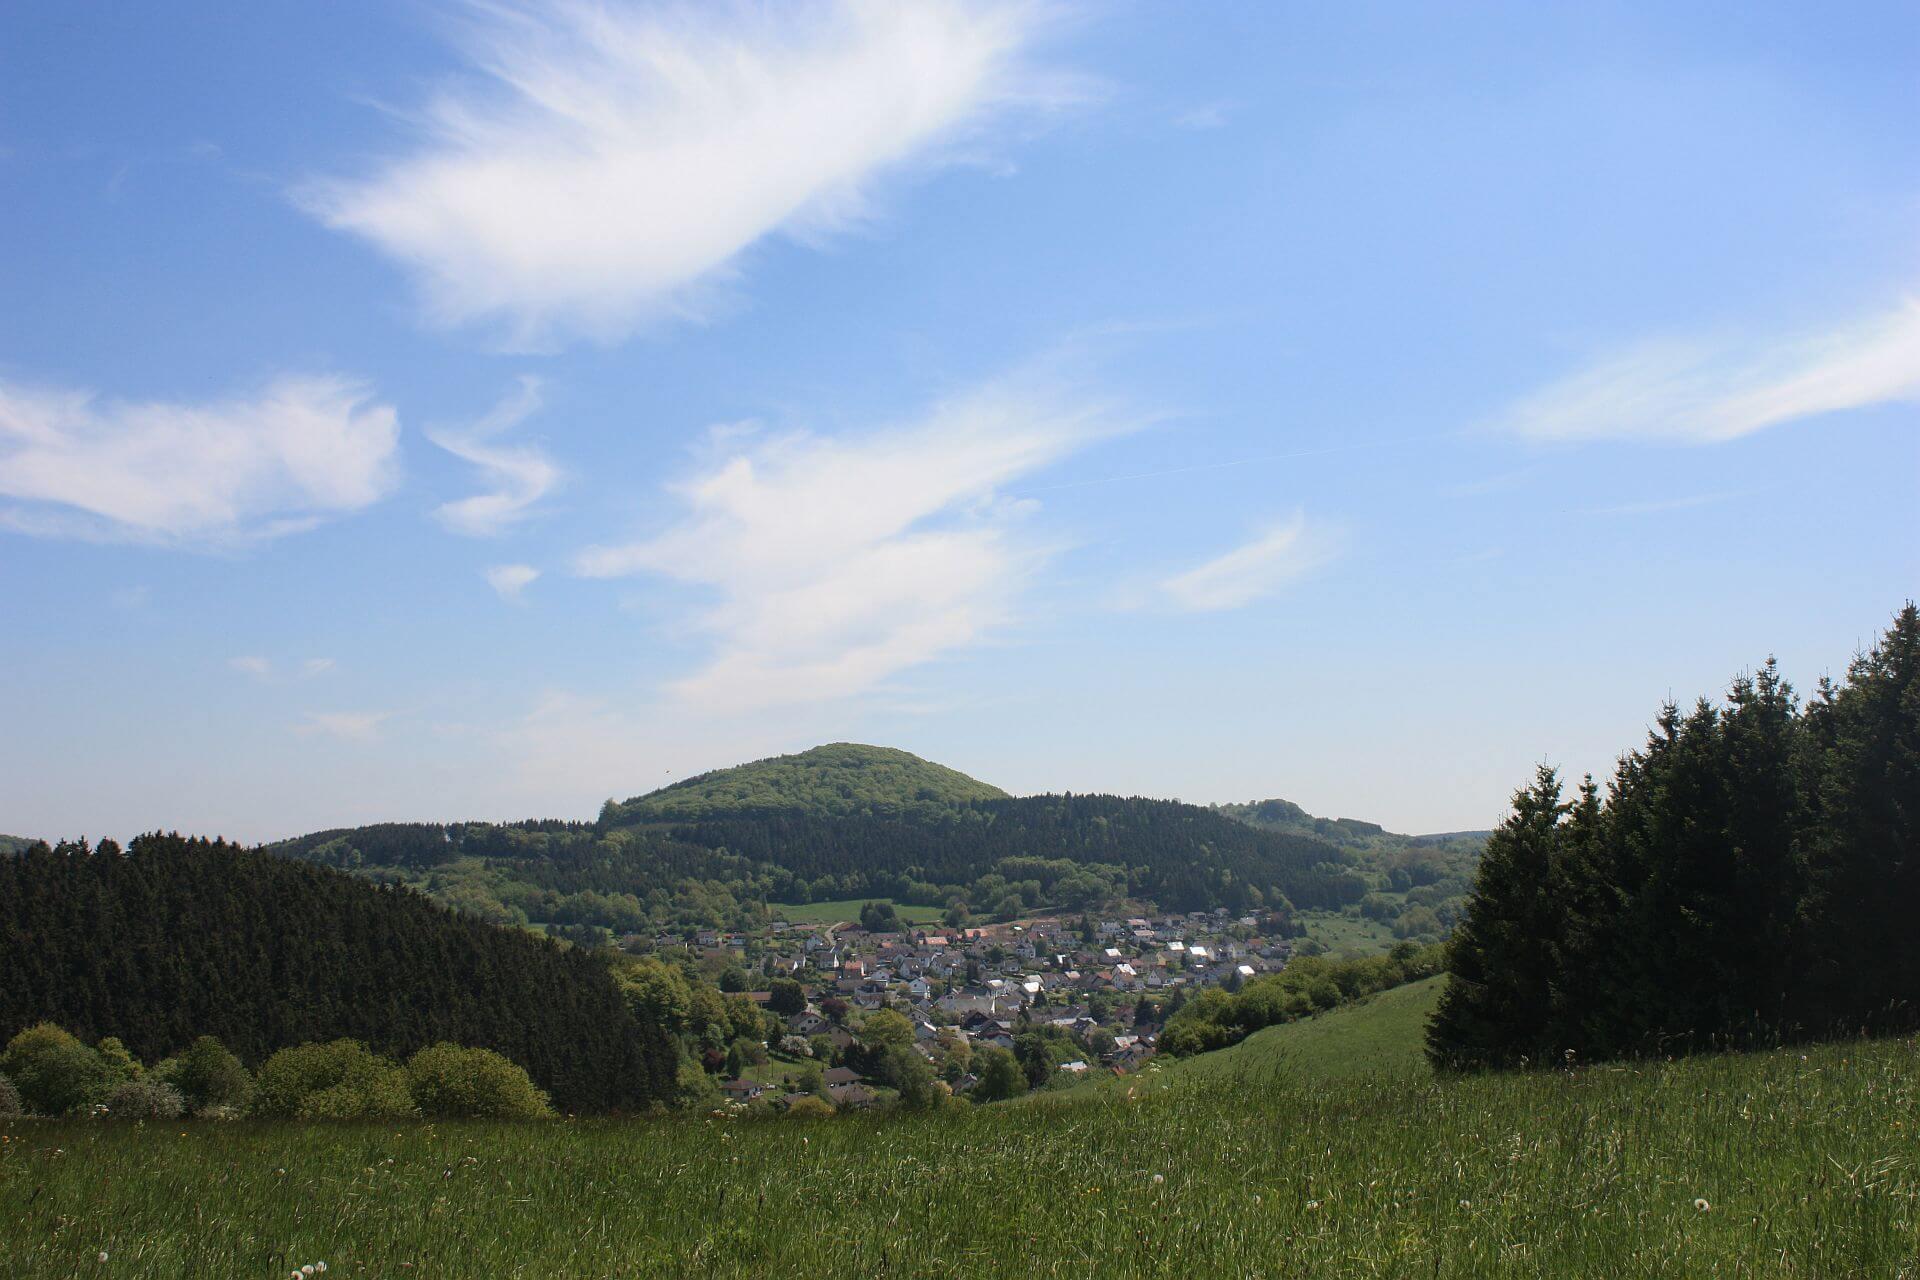 Vulkan Eifel